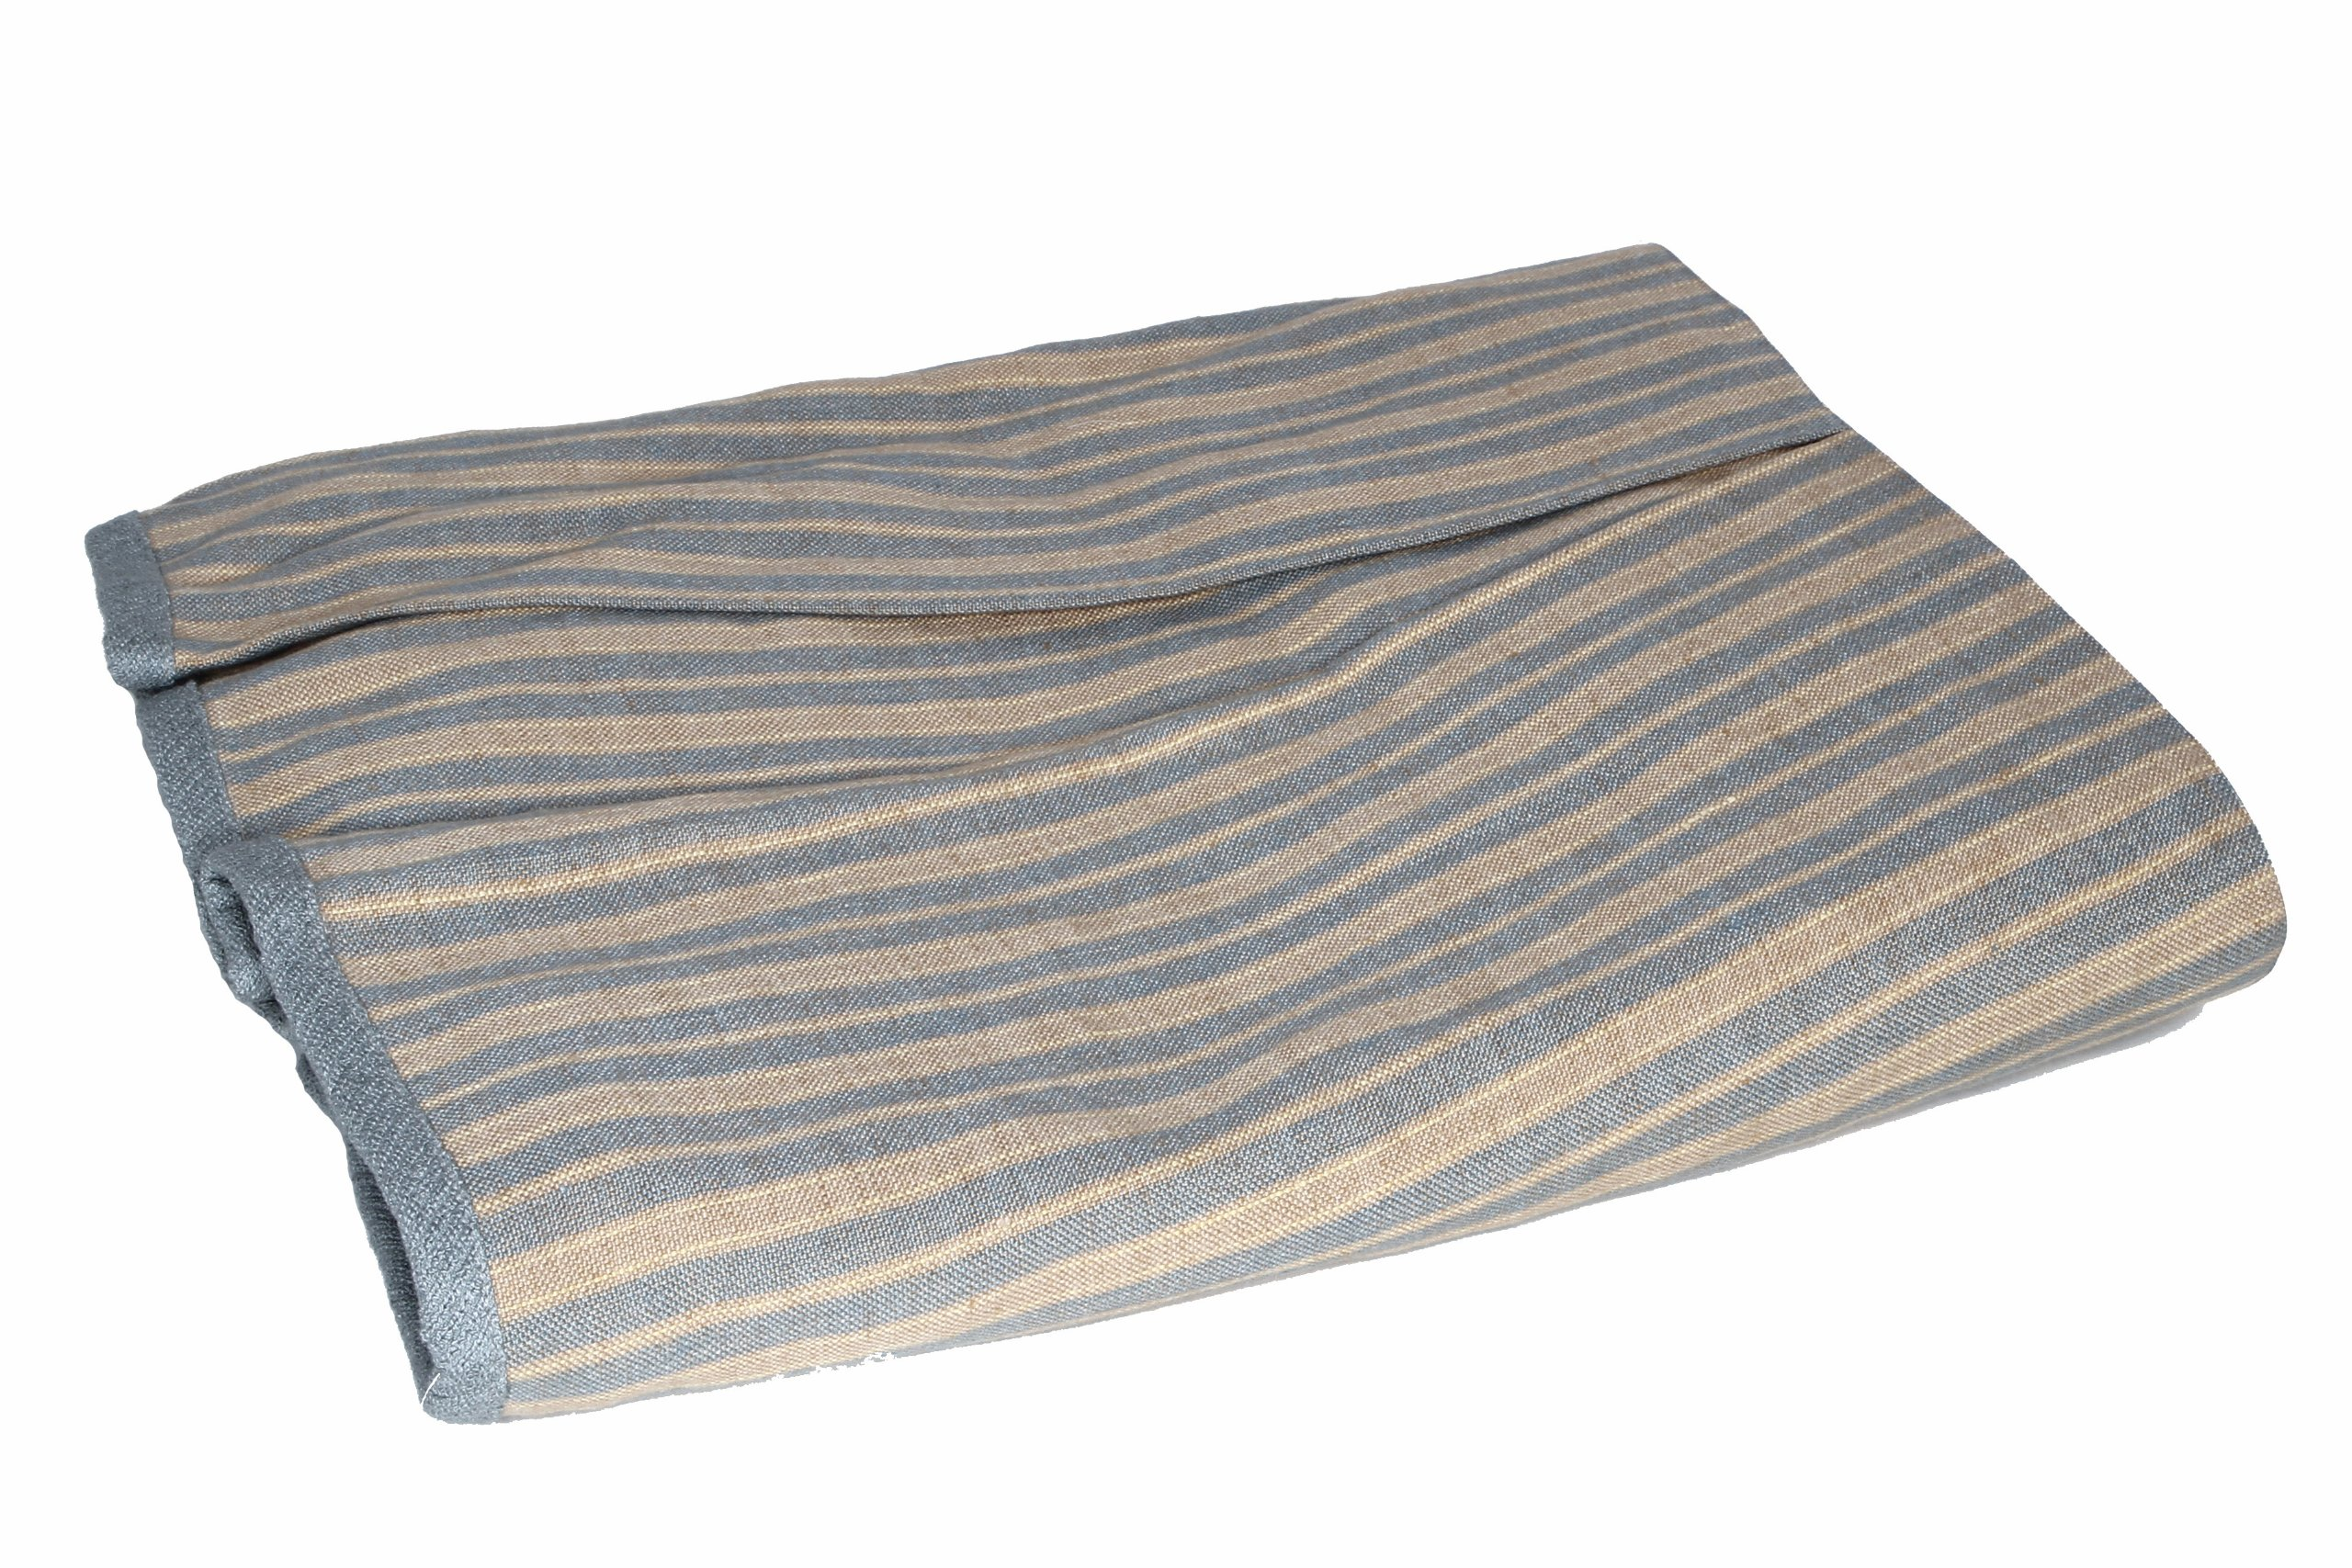 Kathryn Ireland Bradford Italian Stripe Linen Queen Decorative Bed Skirt, Blue